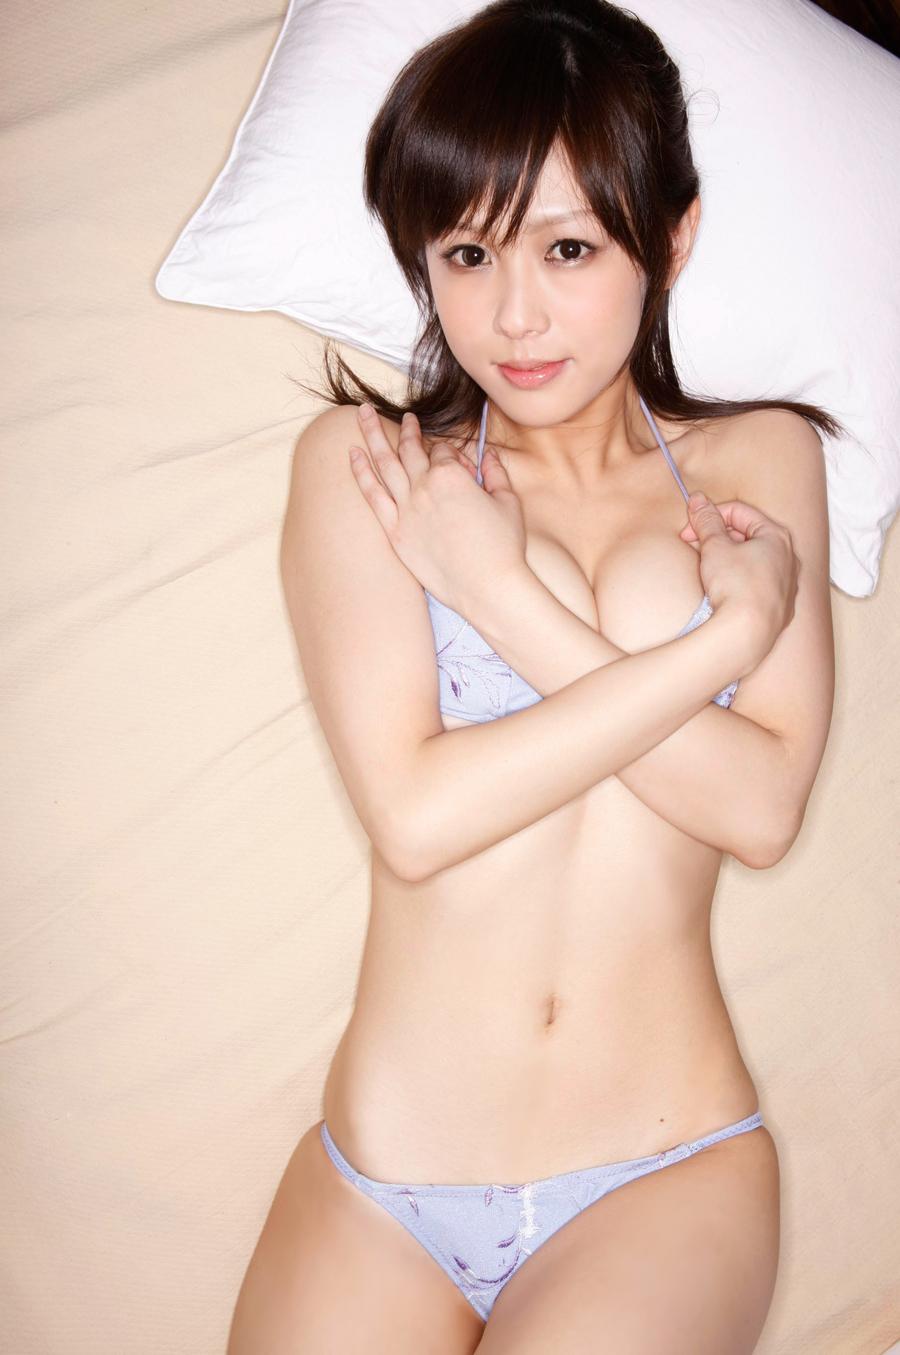 [Princess Collection] Kyoko Kawai 可愛きょうこ 121-130 [10P28MB] 10120